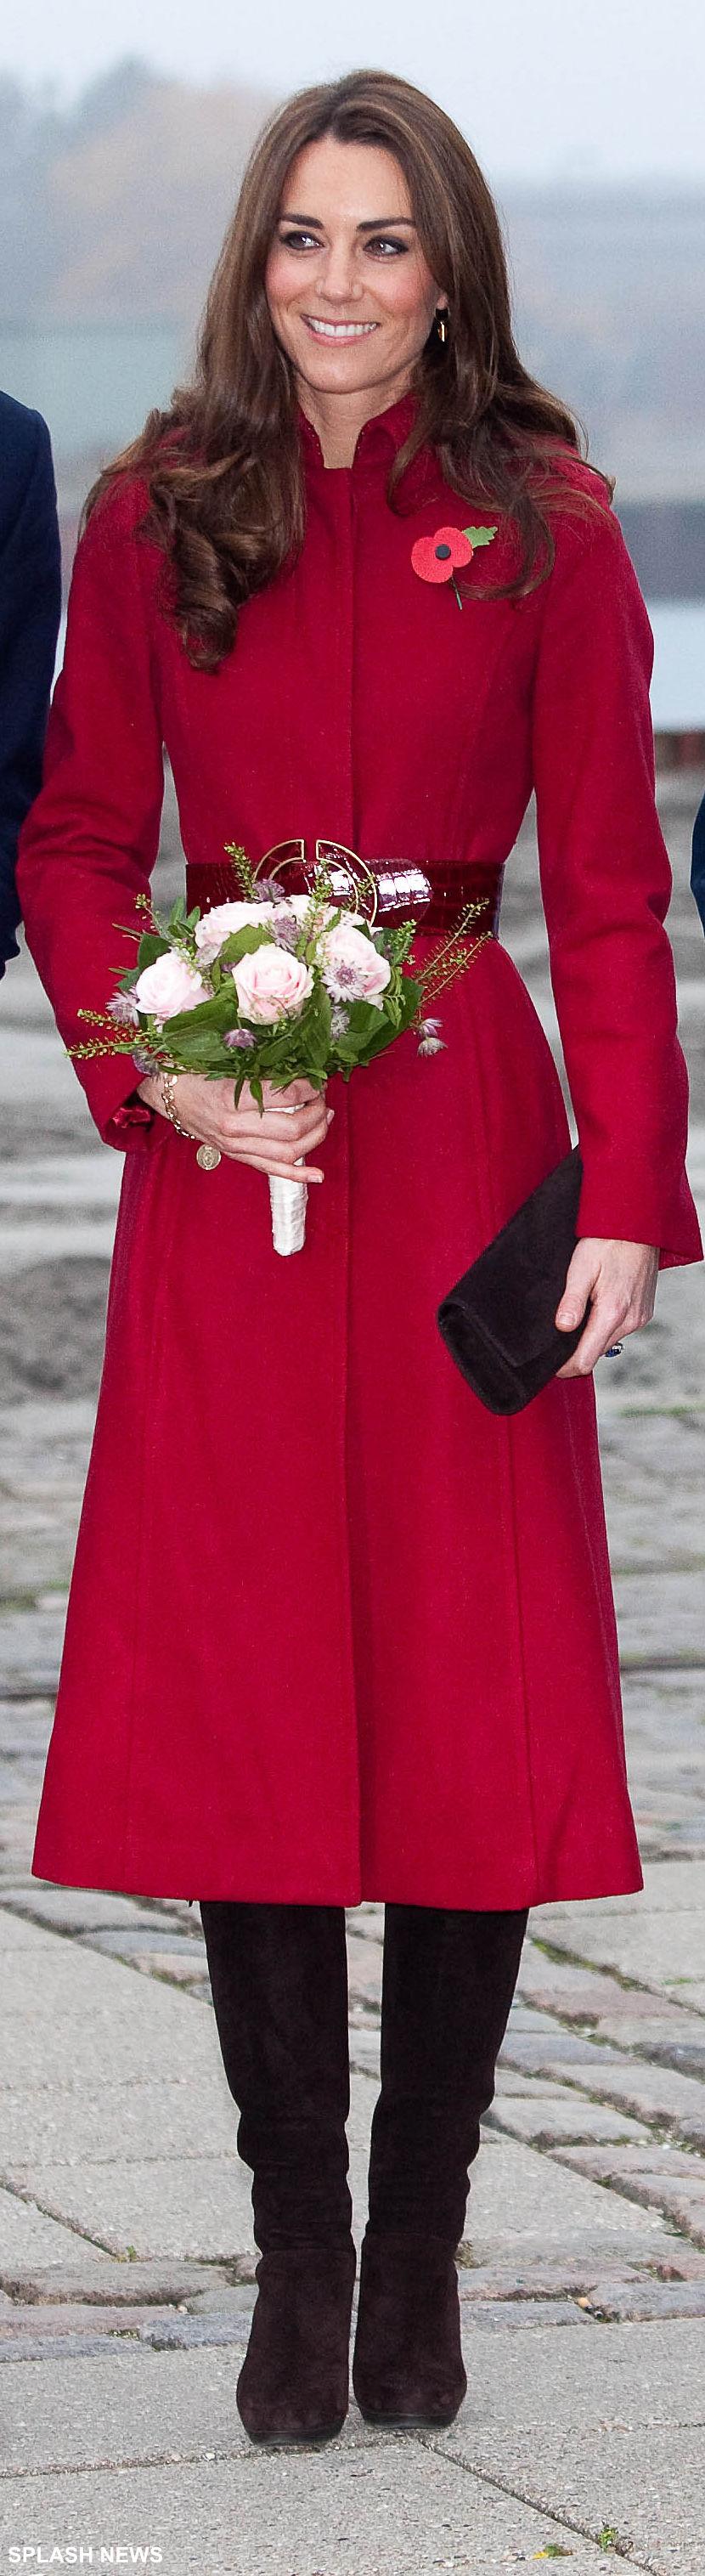 Kate Middleton wearing Stuart Weitzman boots in Denmark, 2011